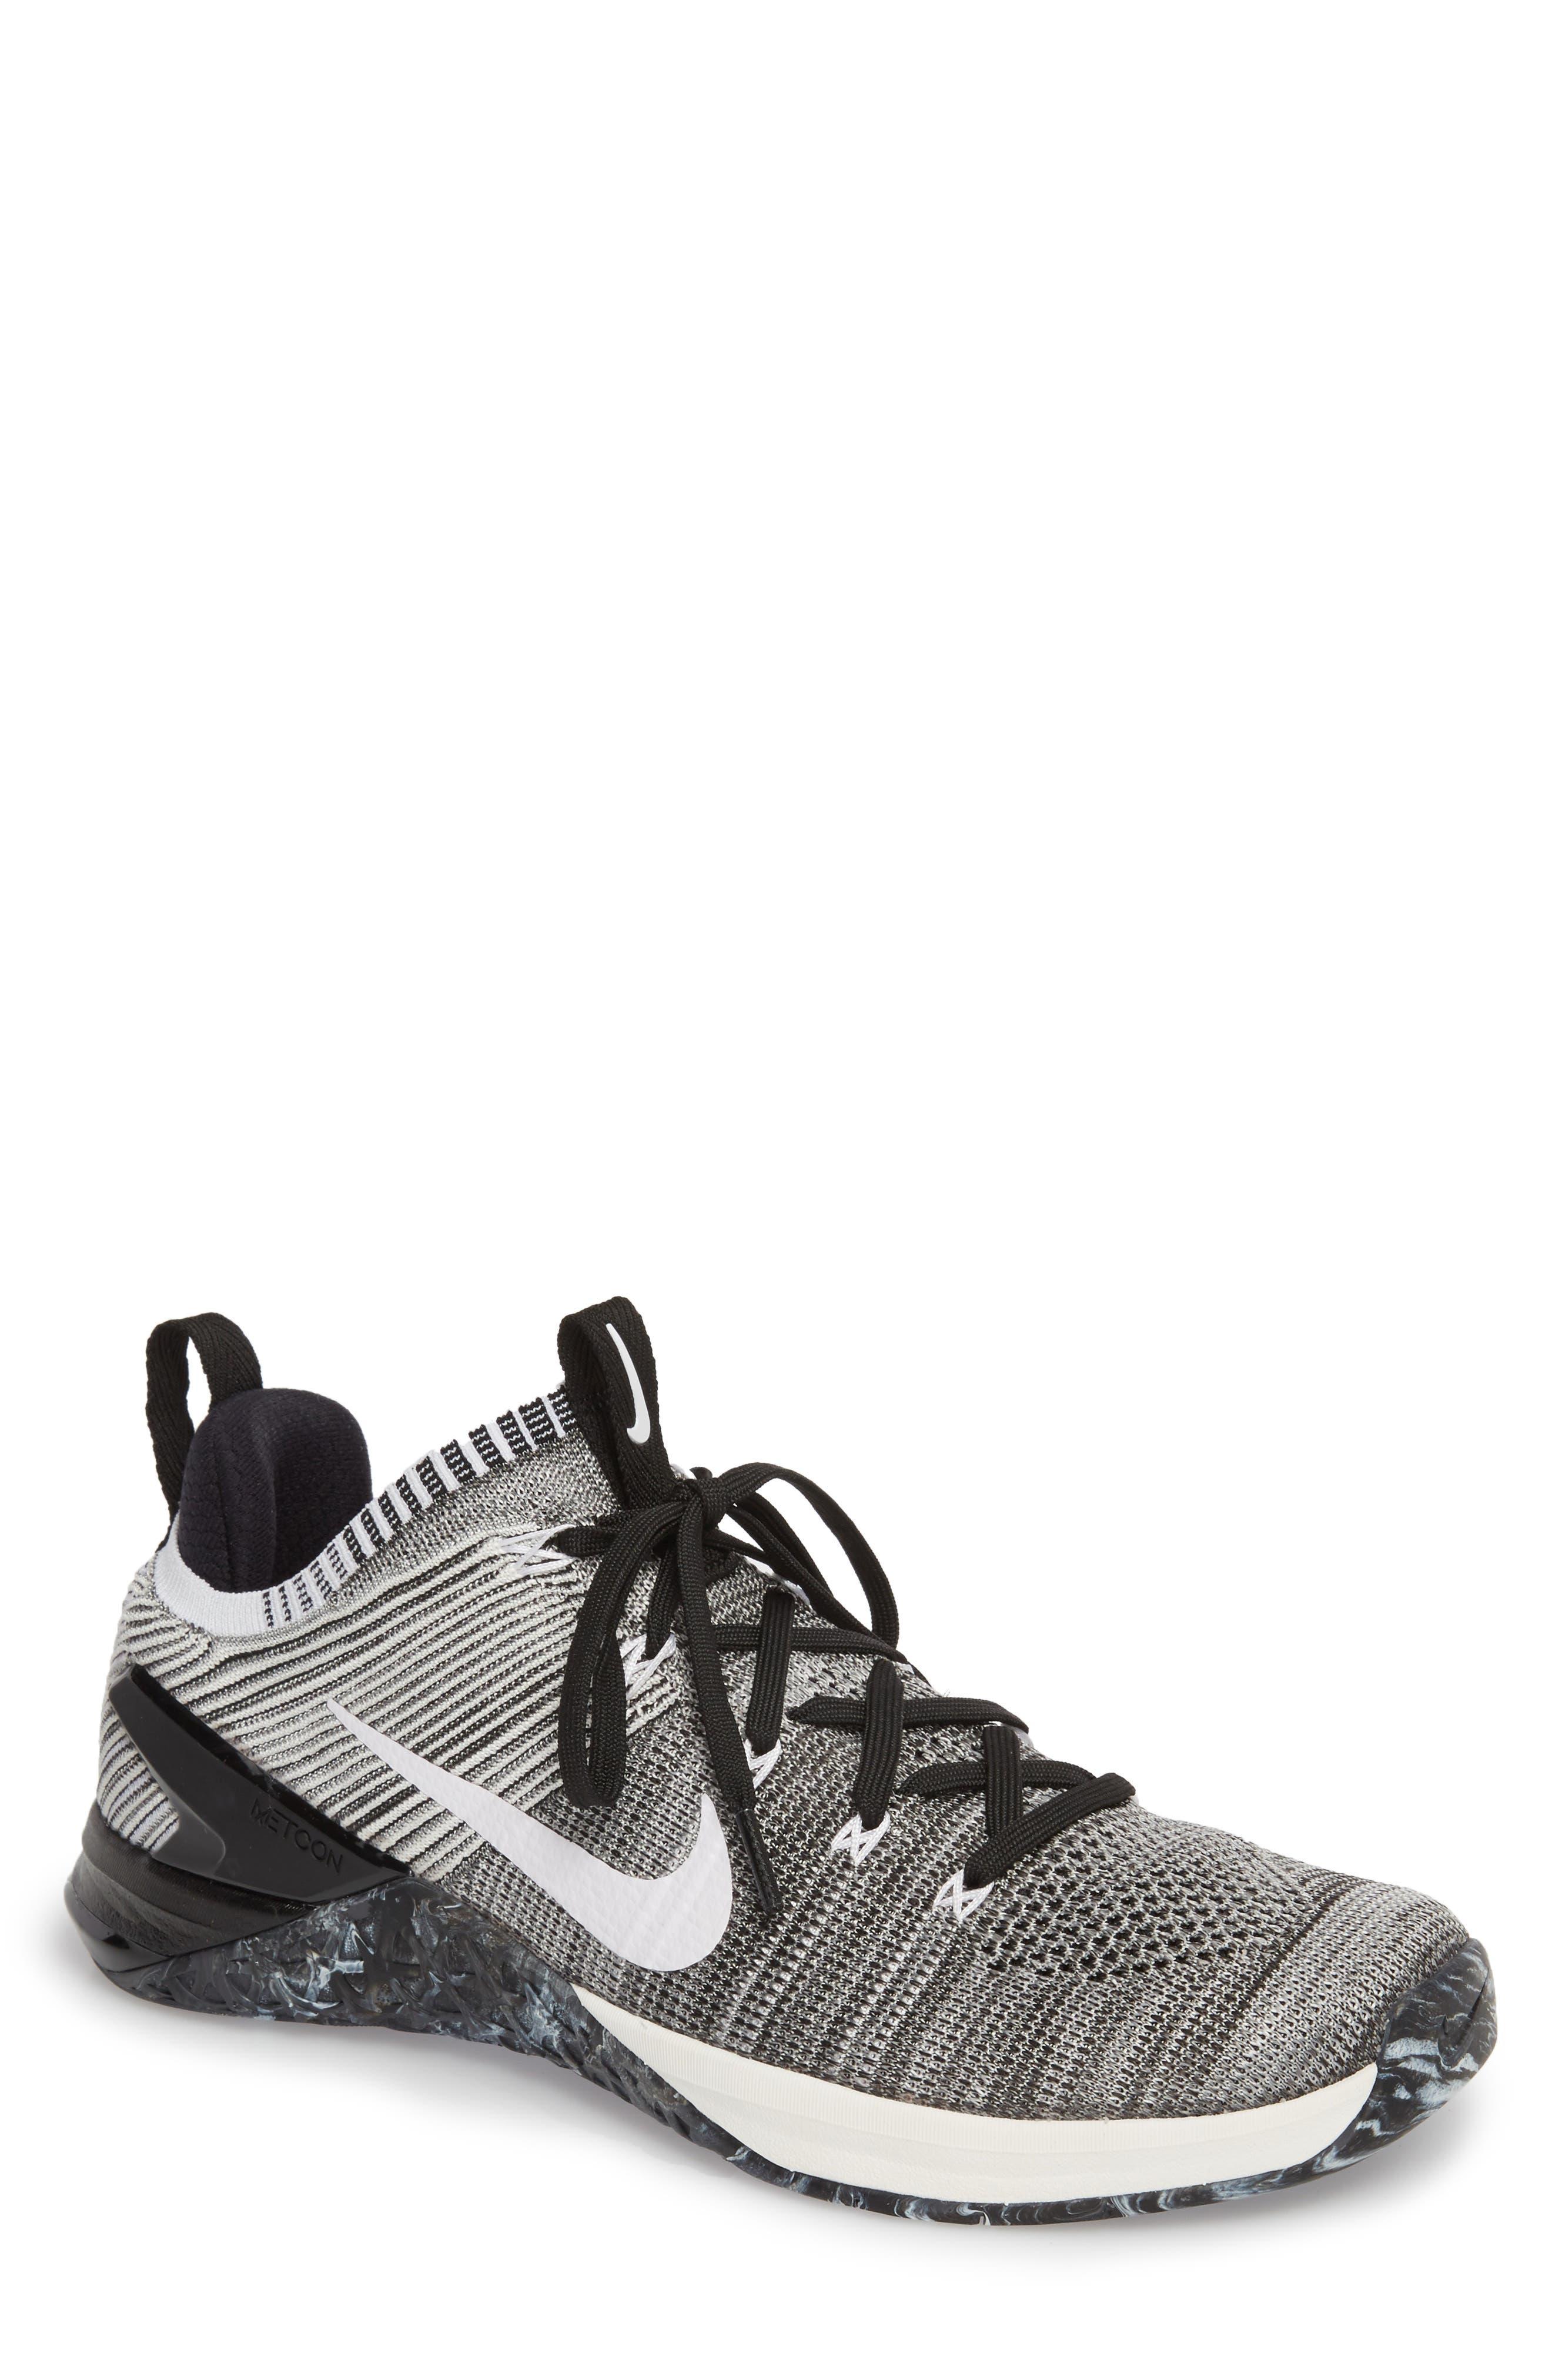 Main Image - Nike Metcon DSX Flyknit 2 Training Shoe (Men)